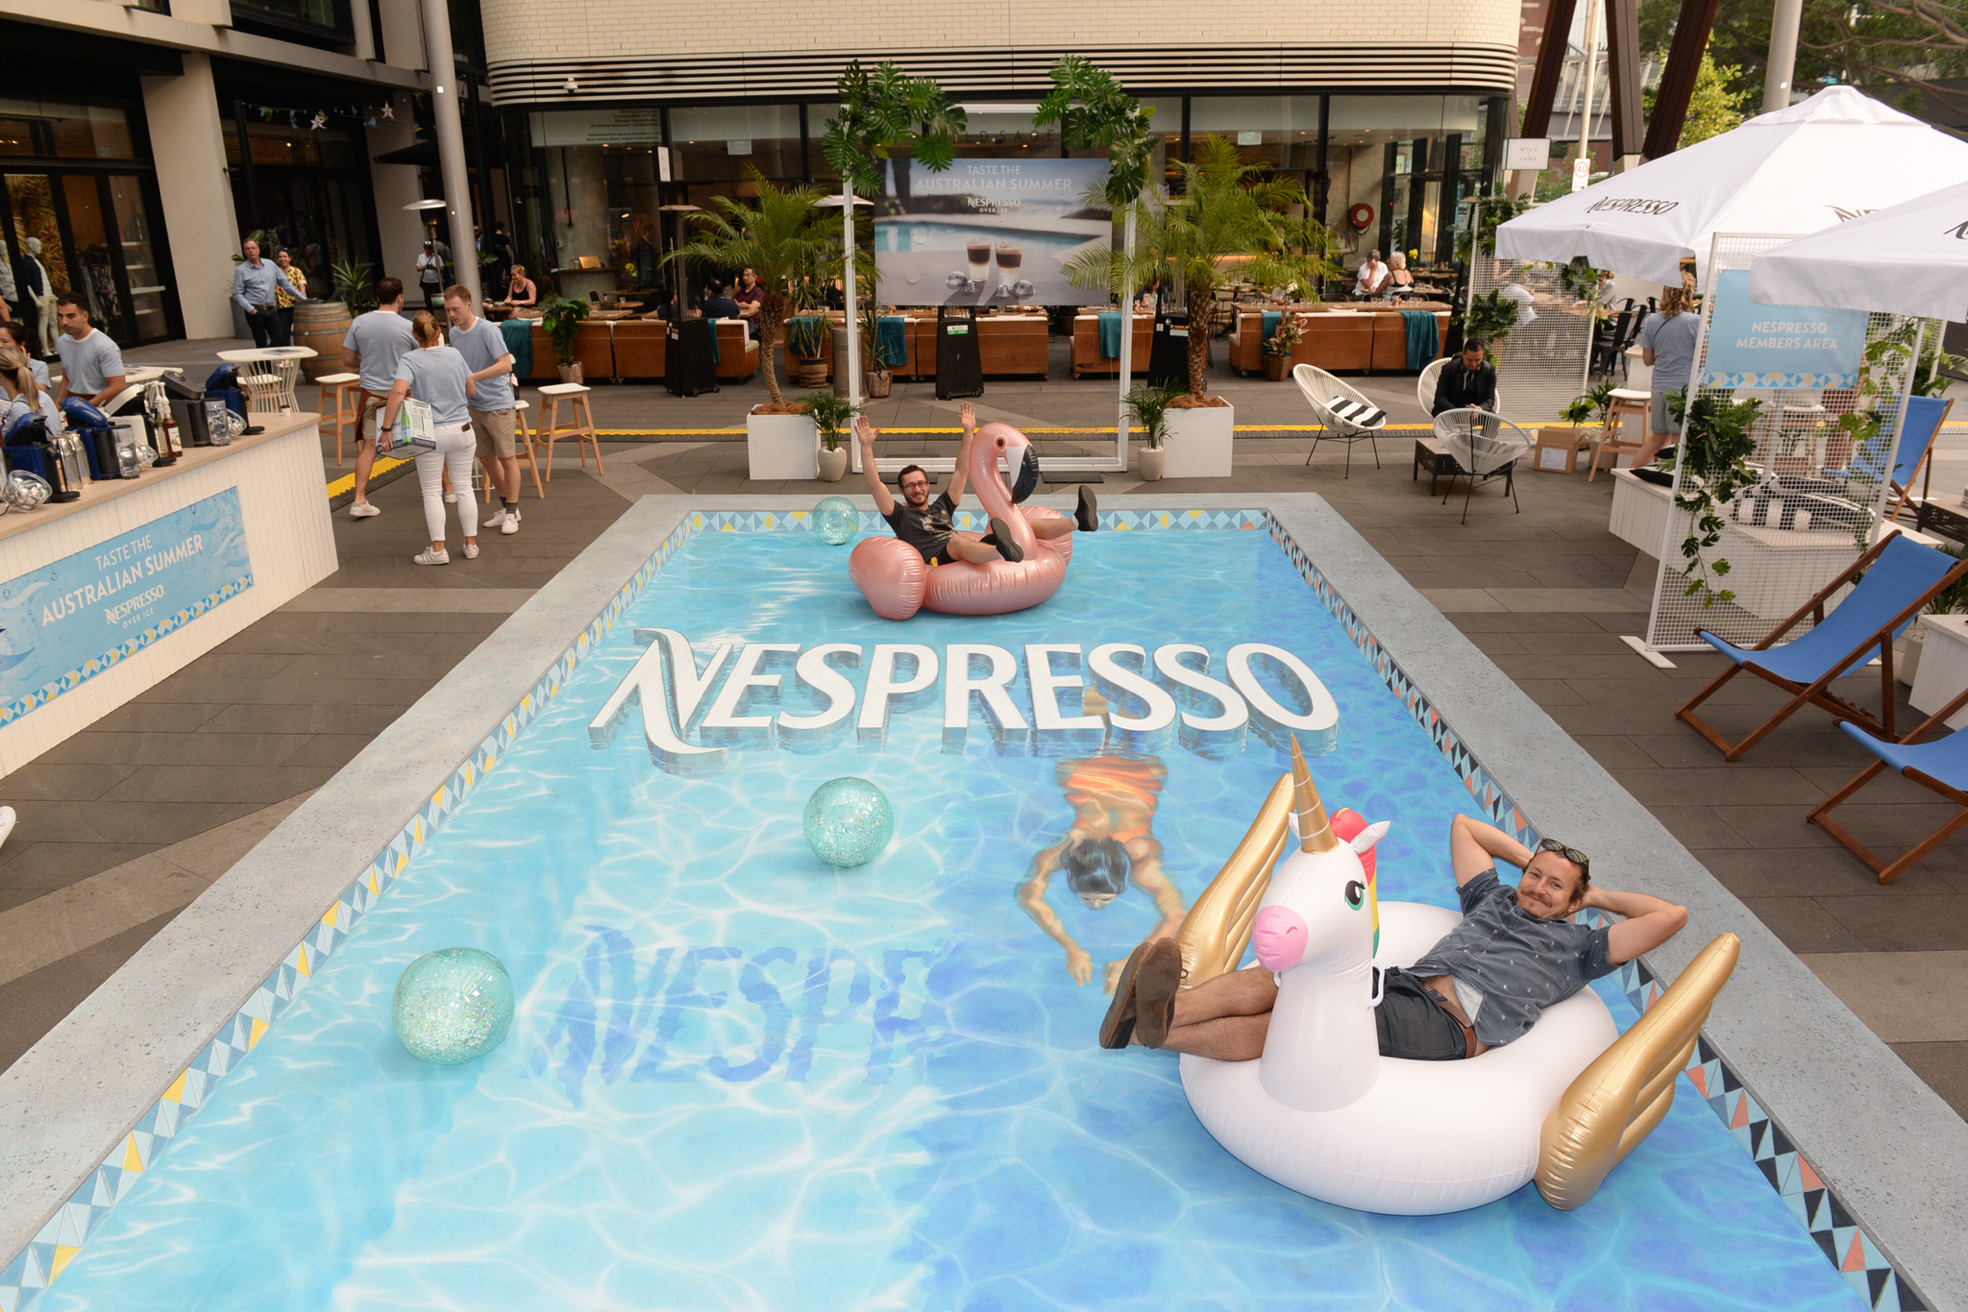 Nespresso Activation pop up @ Bangaroo